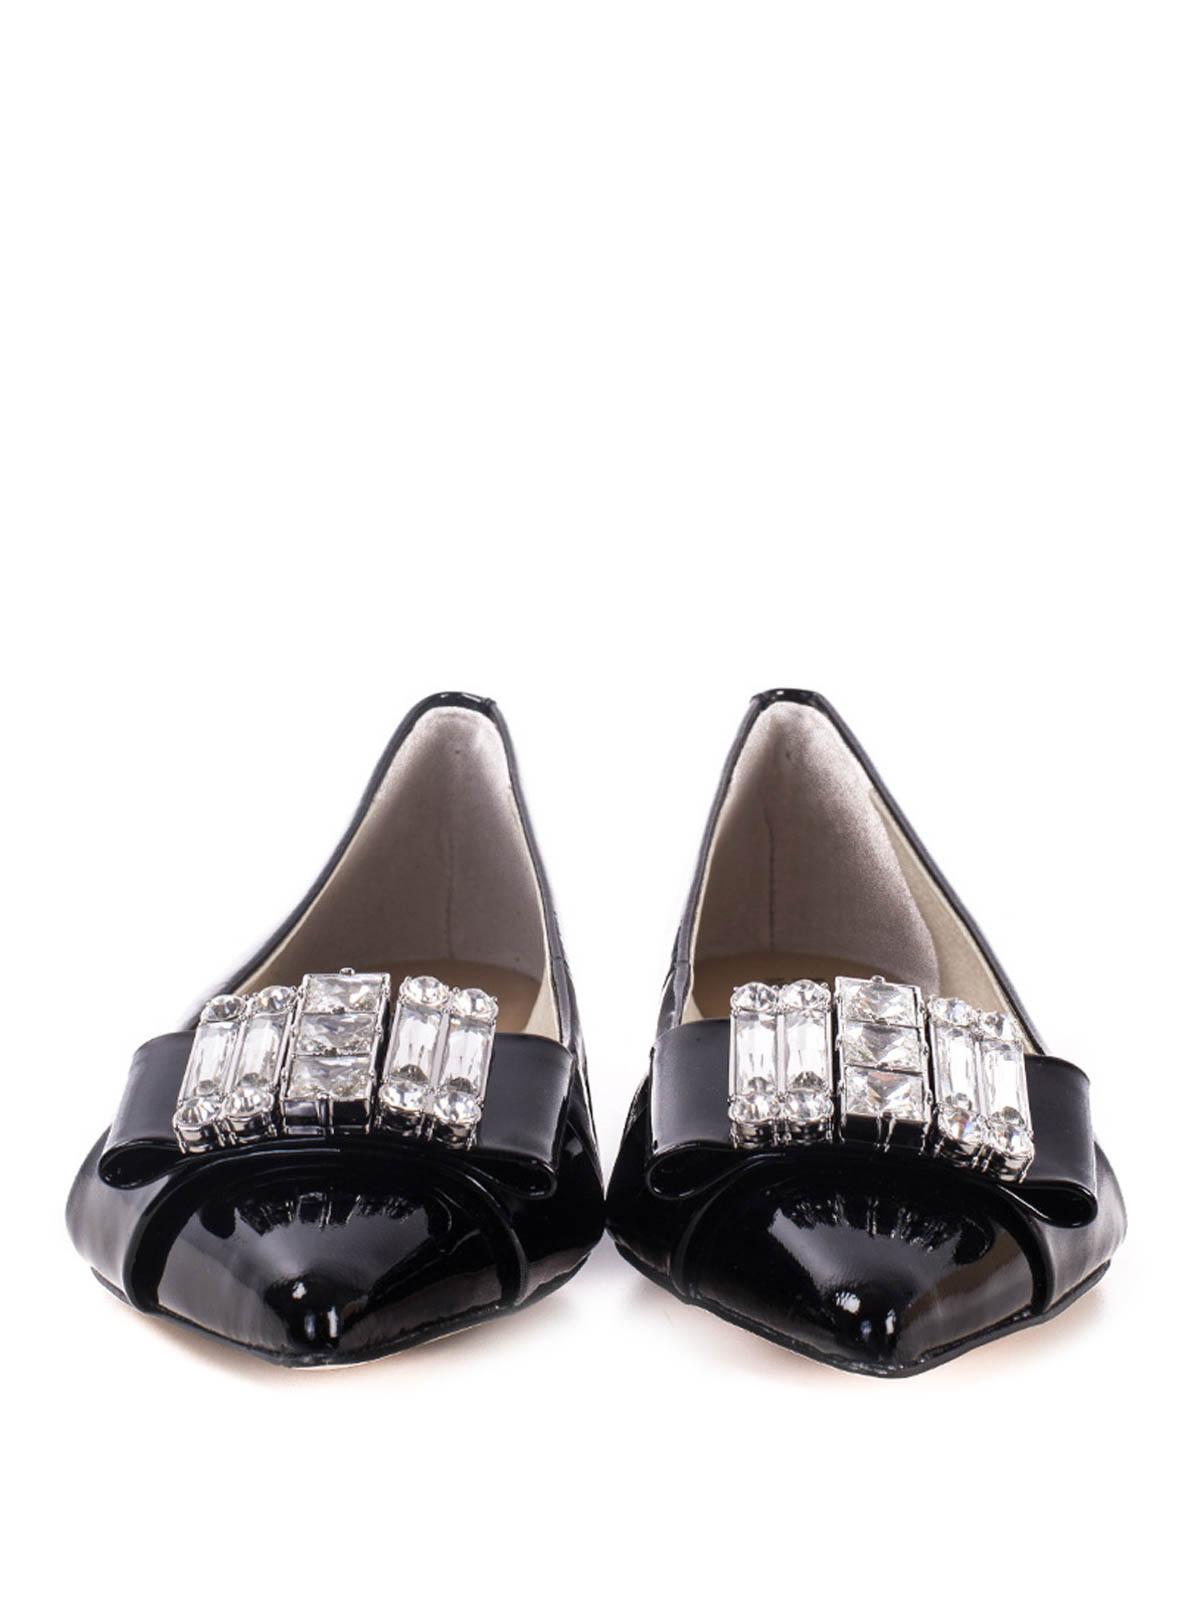 Michael Kors - Michelle patent leather